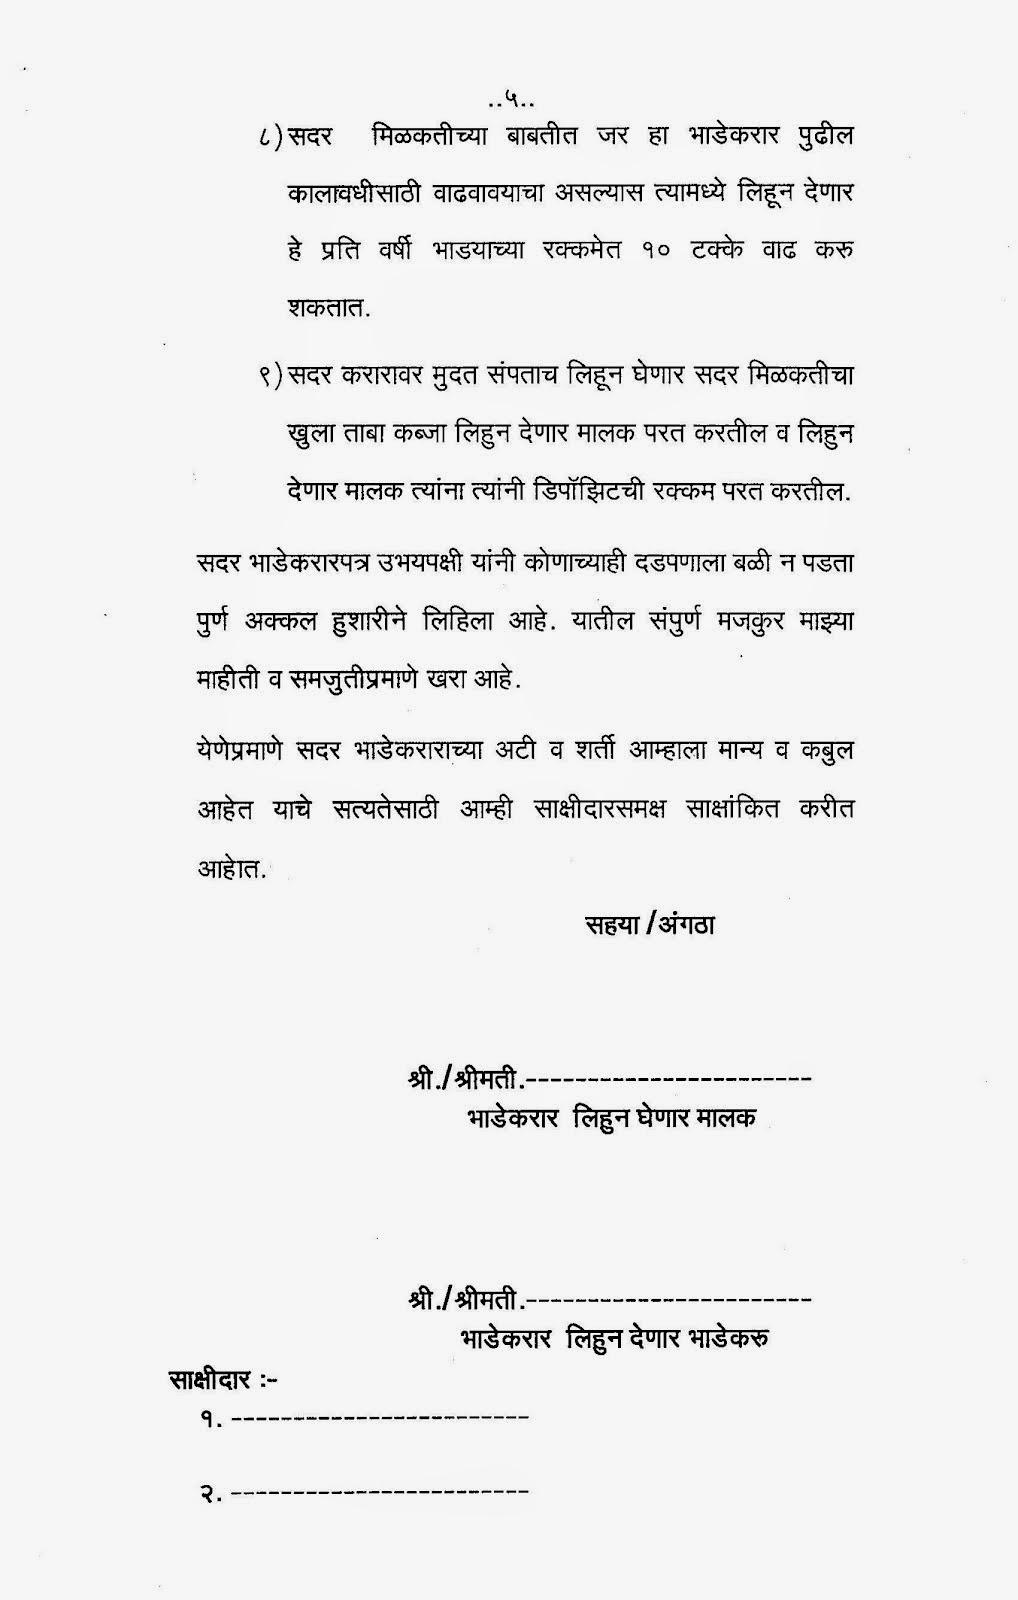 test engineer resume format of rental agreement mobile device test